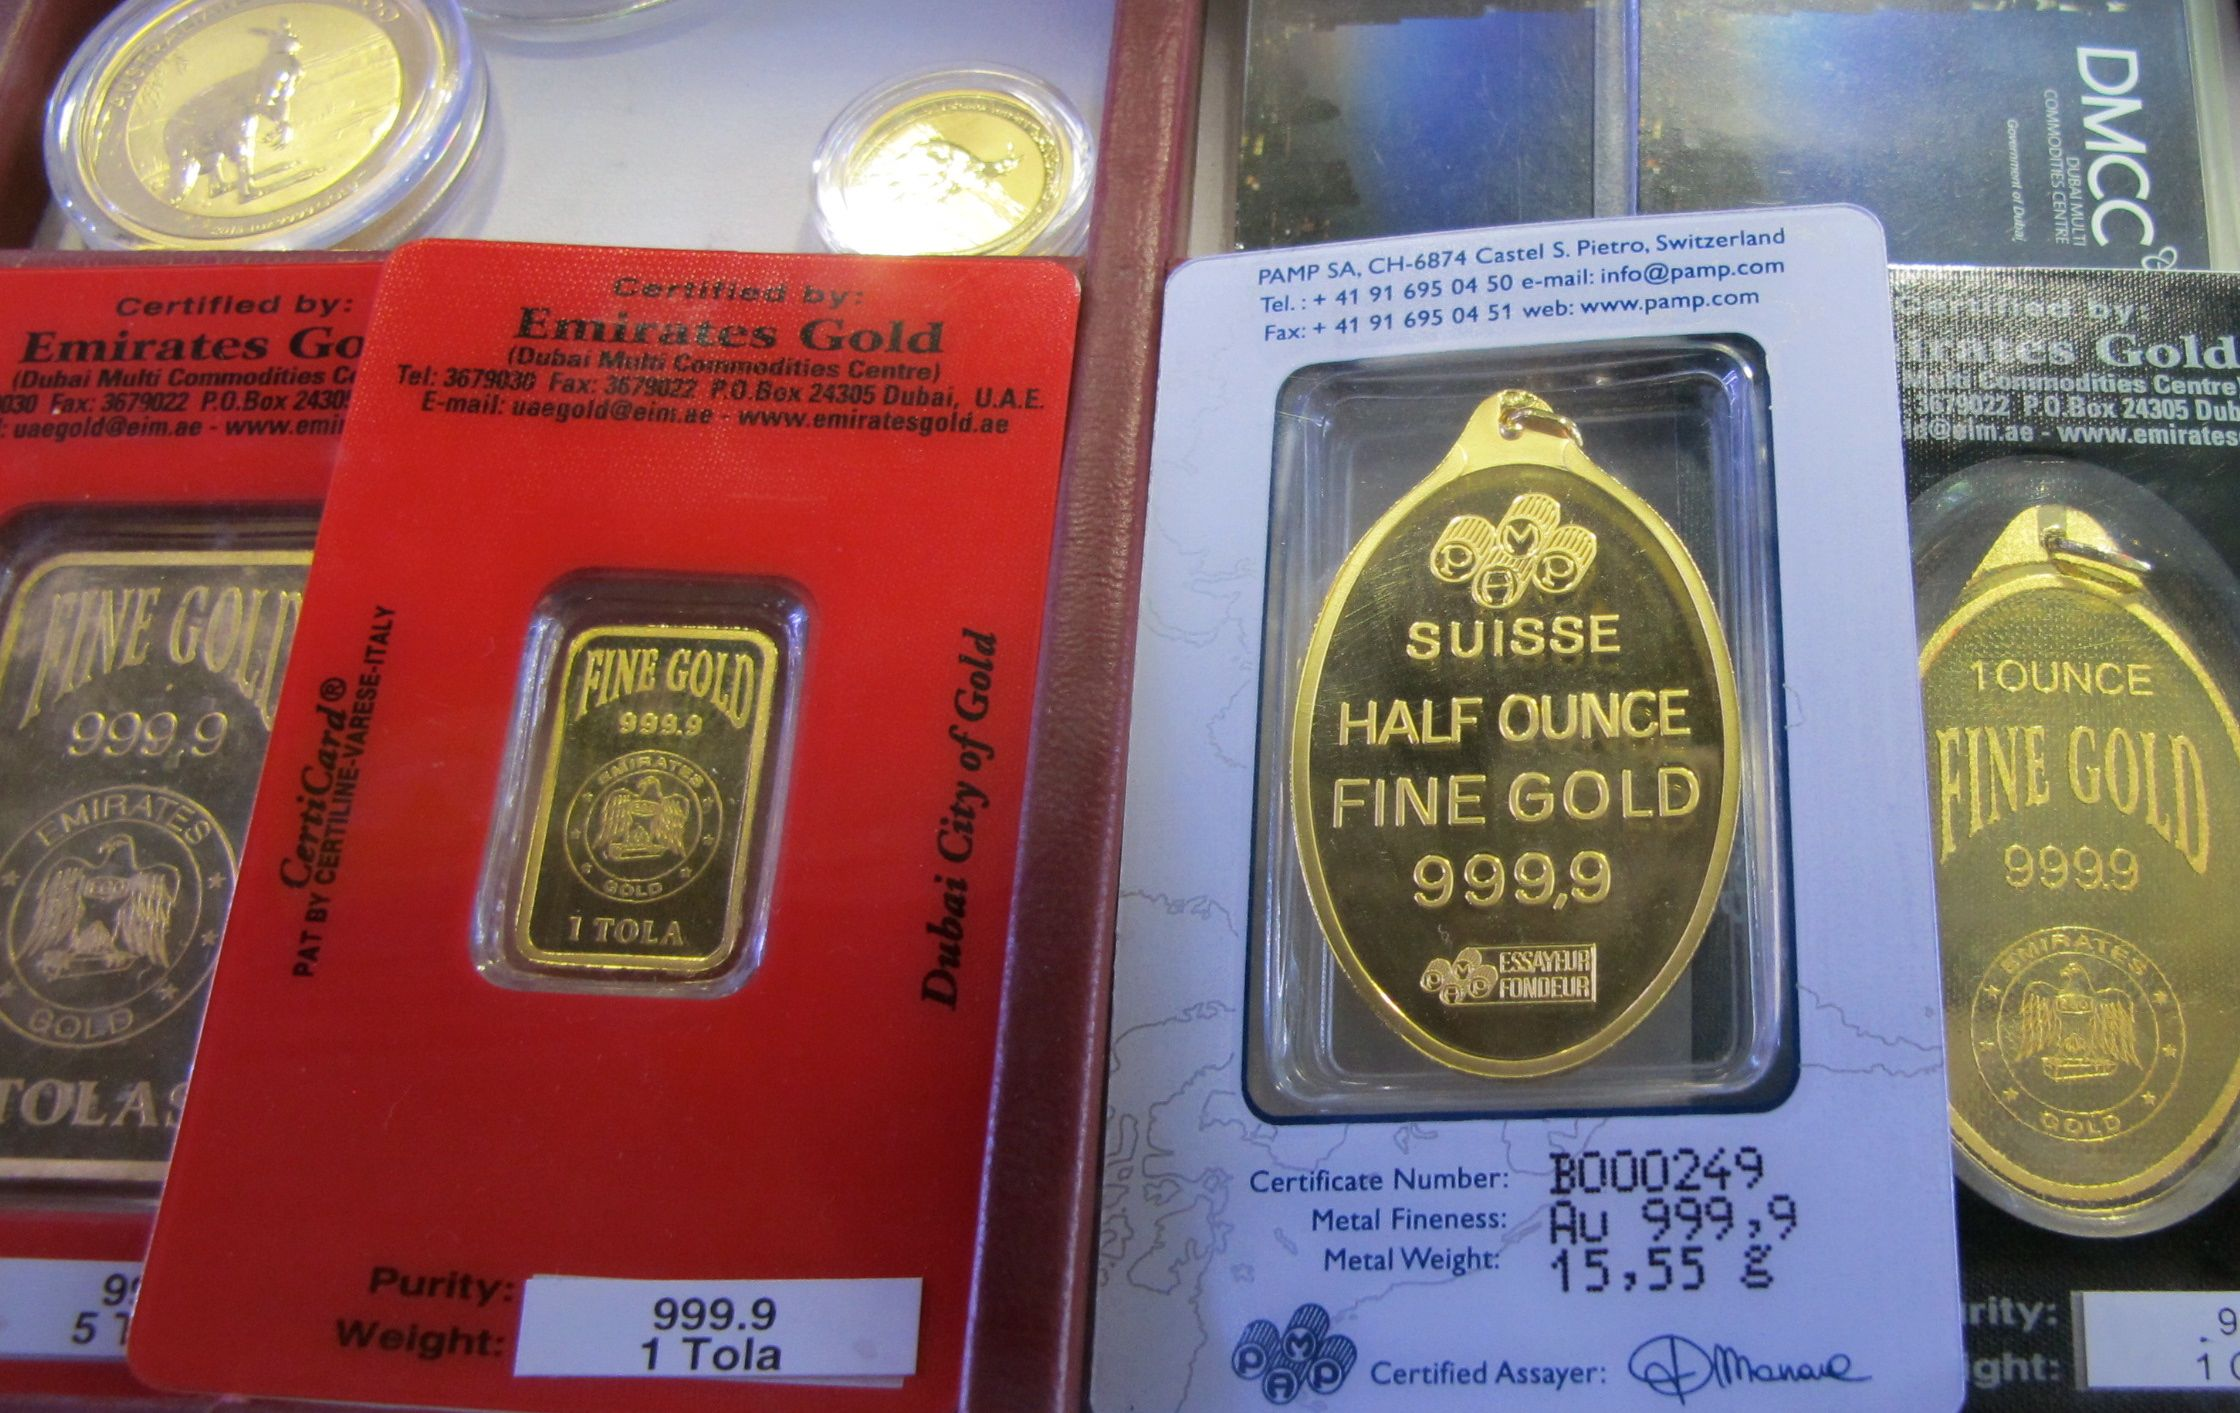 Gold ingots: Swiss and Emirati